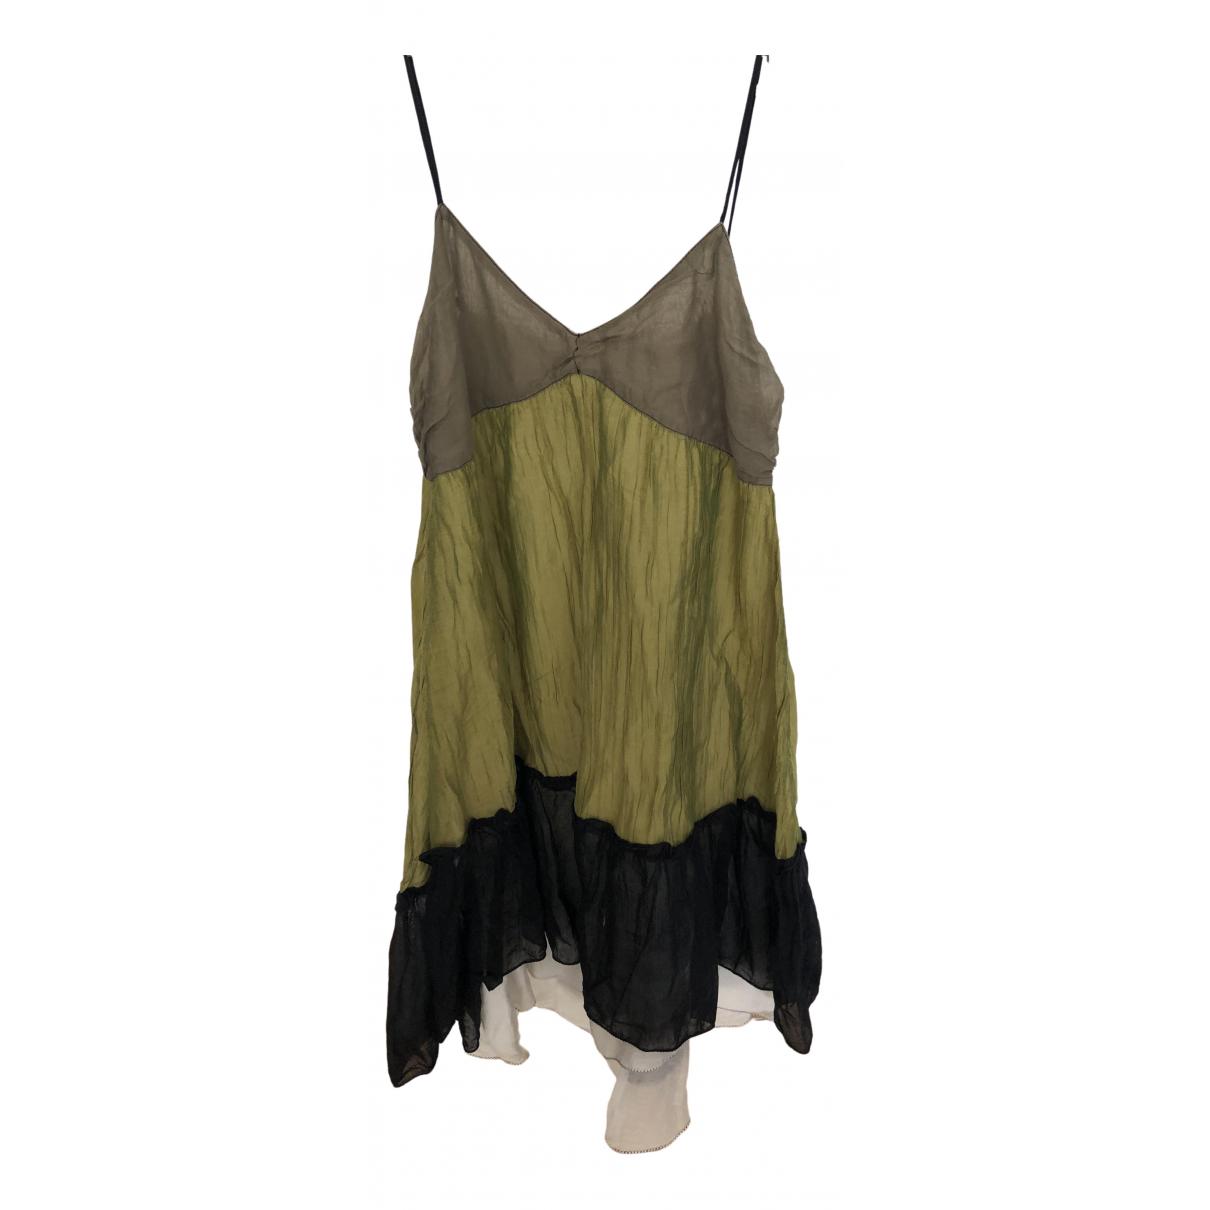 Patrizia Pepe \N Multicolour Cotton dress for Women 44 IT